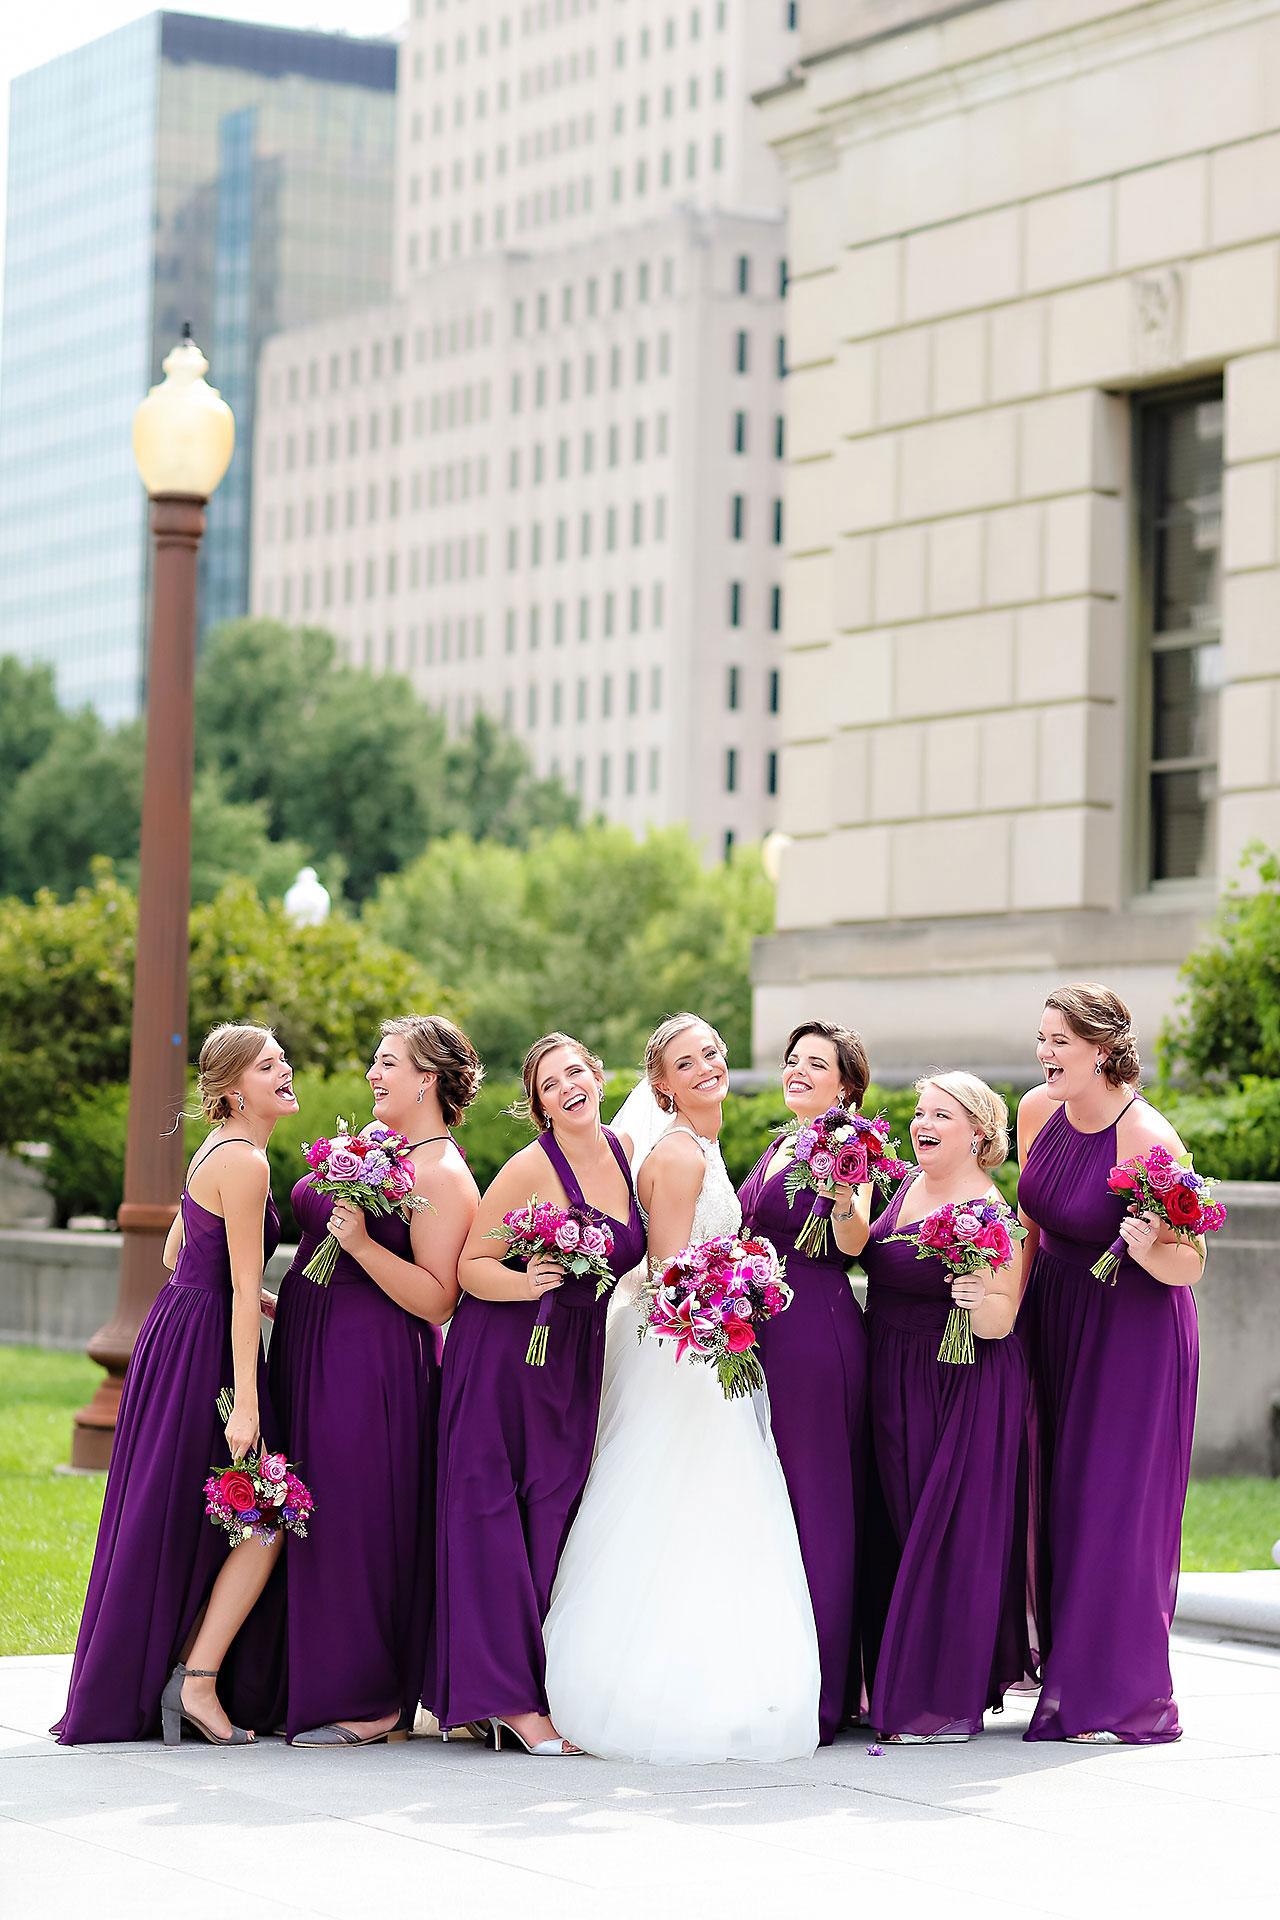 Serra Alex Regions Tower Indianapolis Wedding 081 watermarked